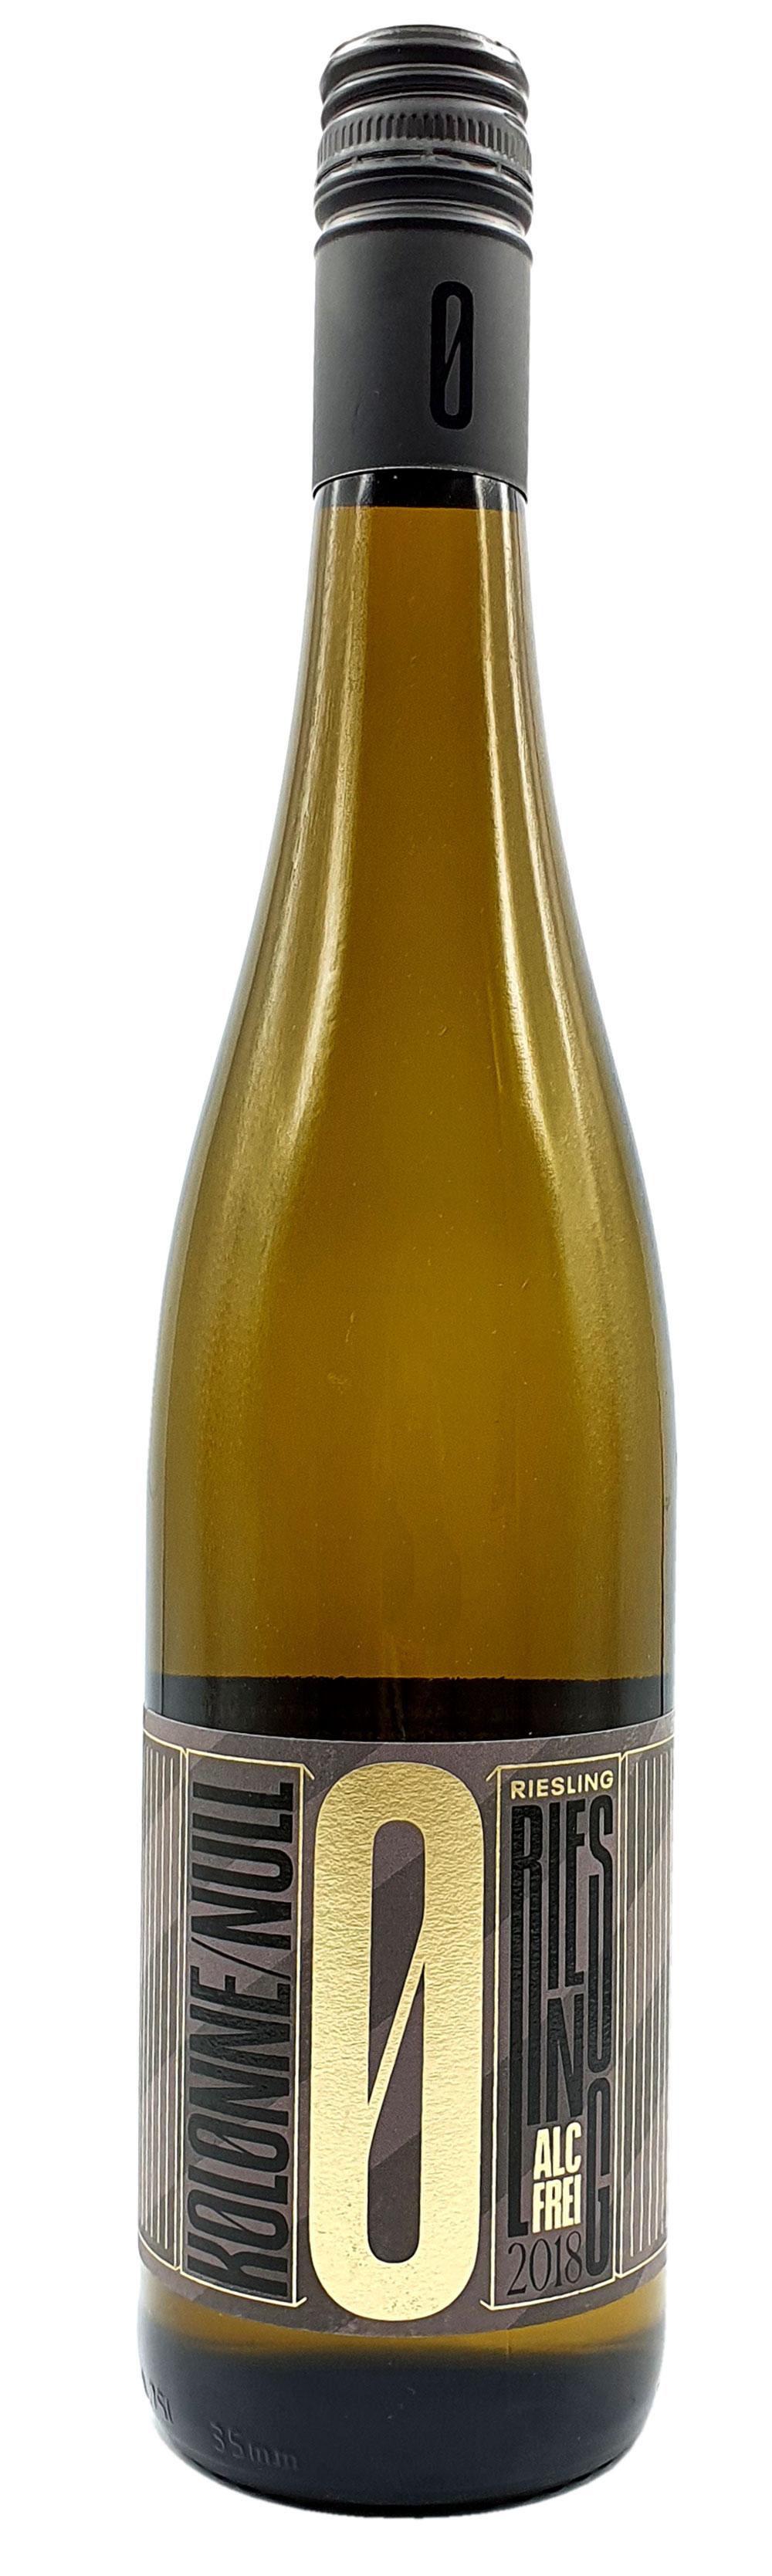 Kolonne Null - 0% Alkohol - Riesling mit Drehverschluss - Alkoholfreier Riesling 0,75L- [Enthält Sulfite]